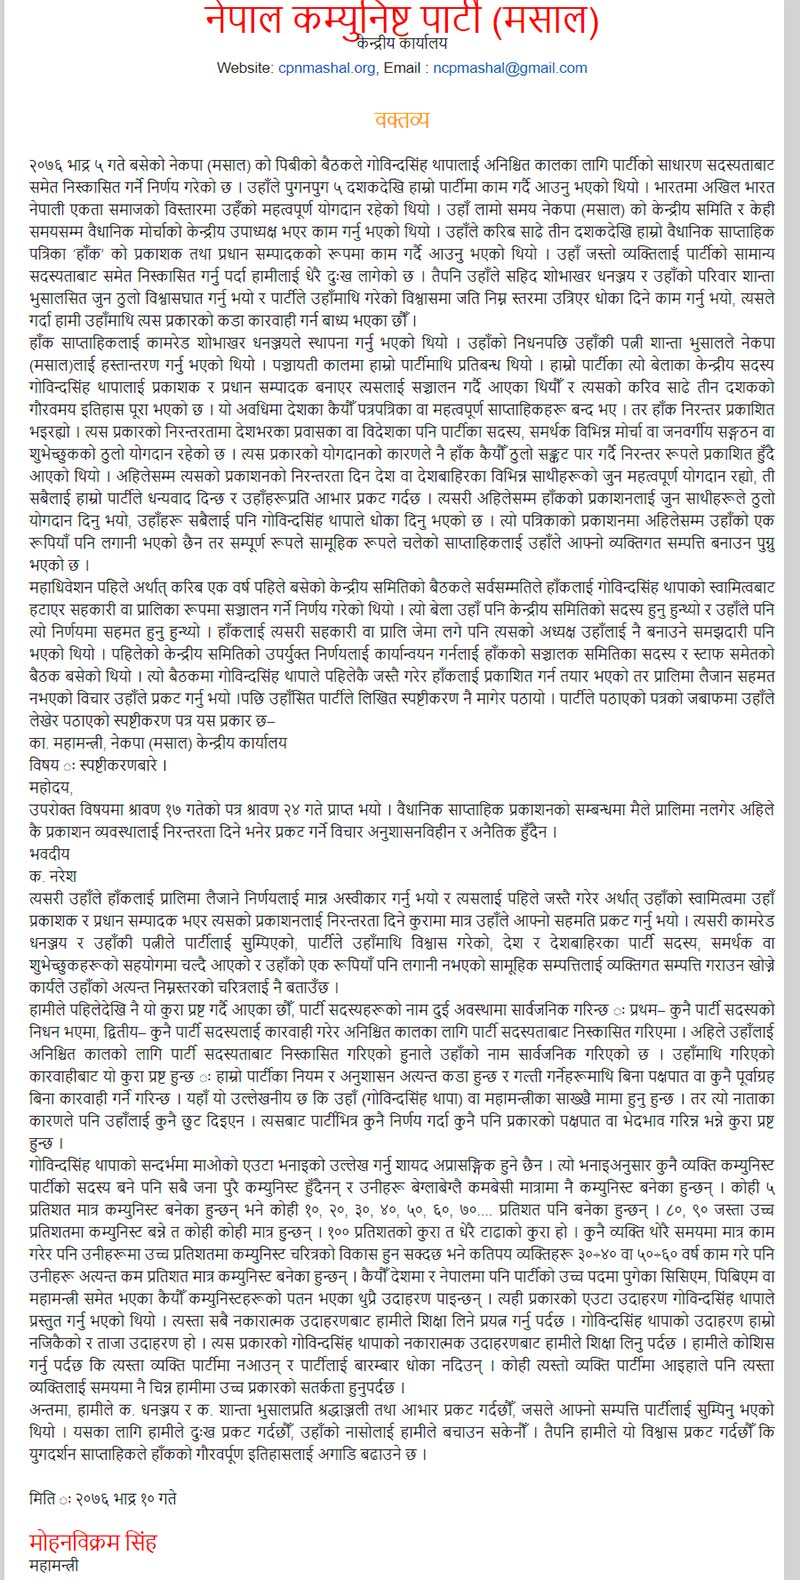 CPN Masal Statement by Mohan Bikram Singh